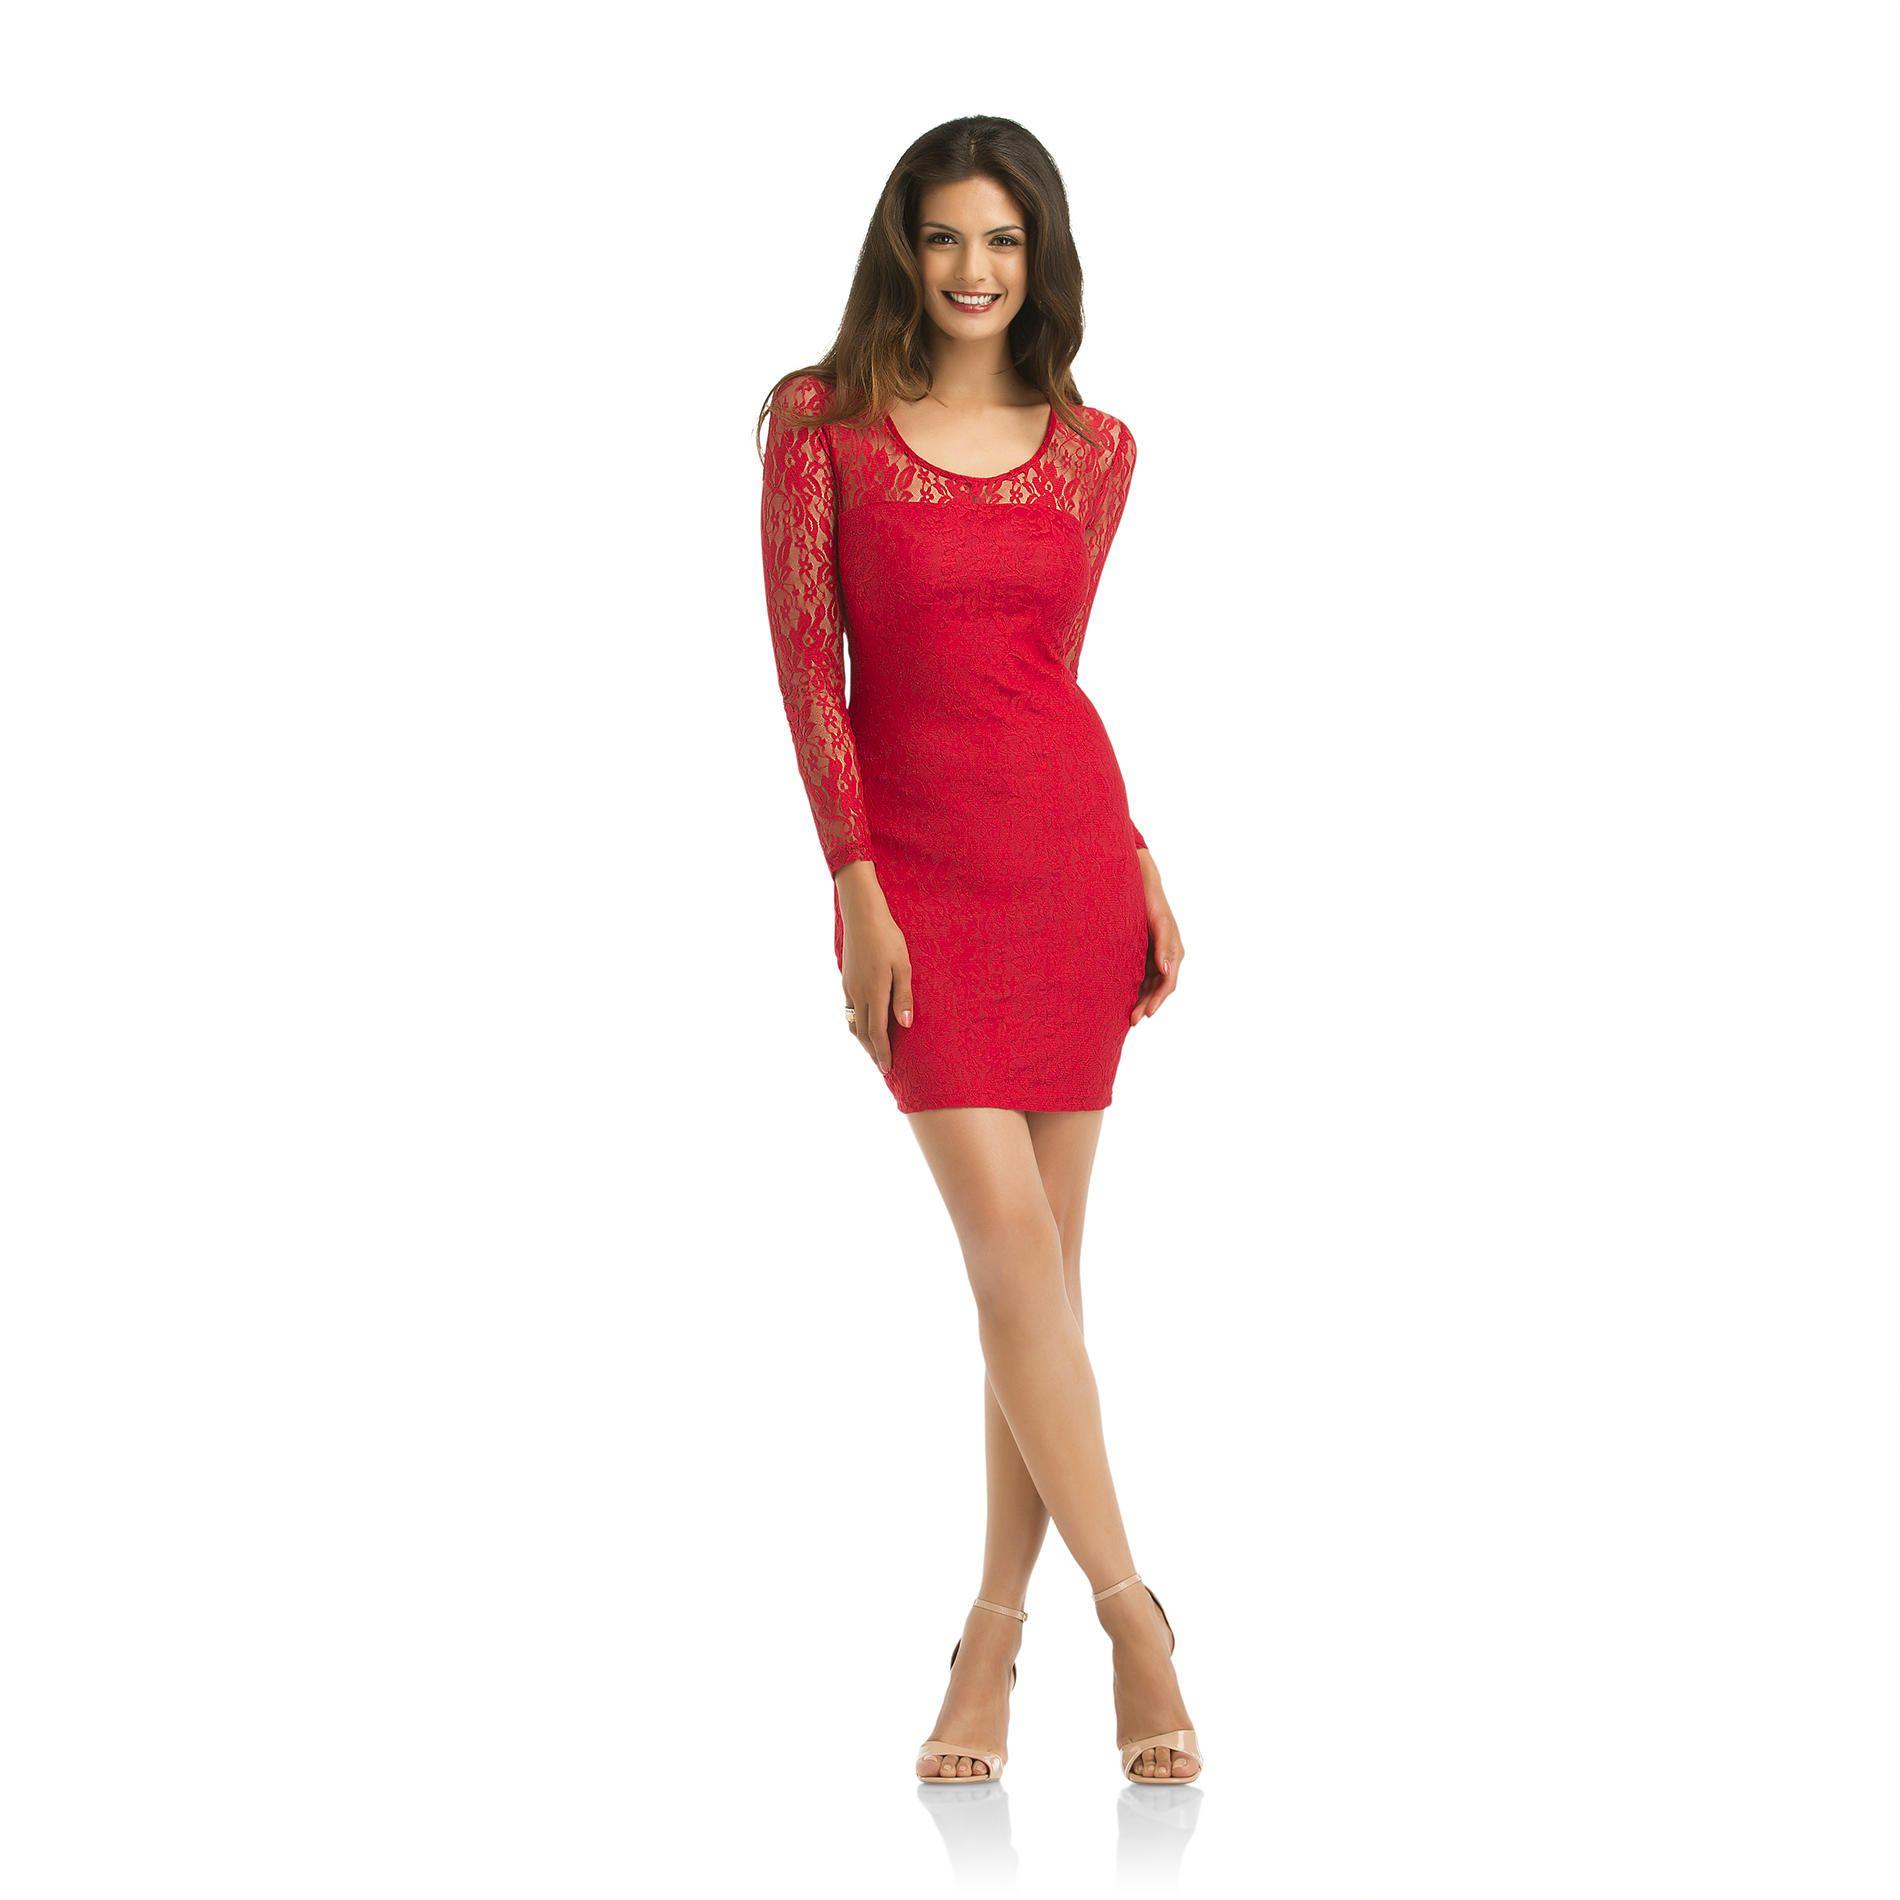 60e23f87fe2 Kardashian Kollection- -Women s Lace Body-Con Dress-Clothing-Women s-Dresses